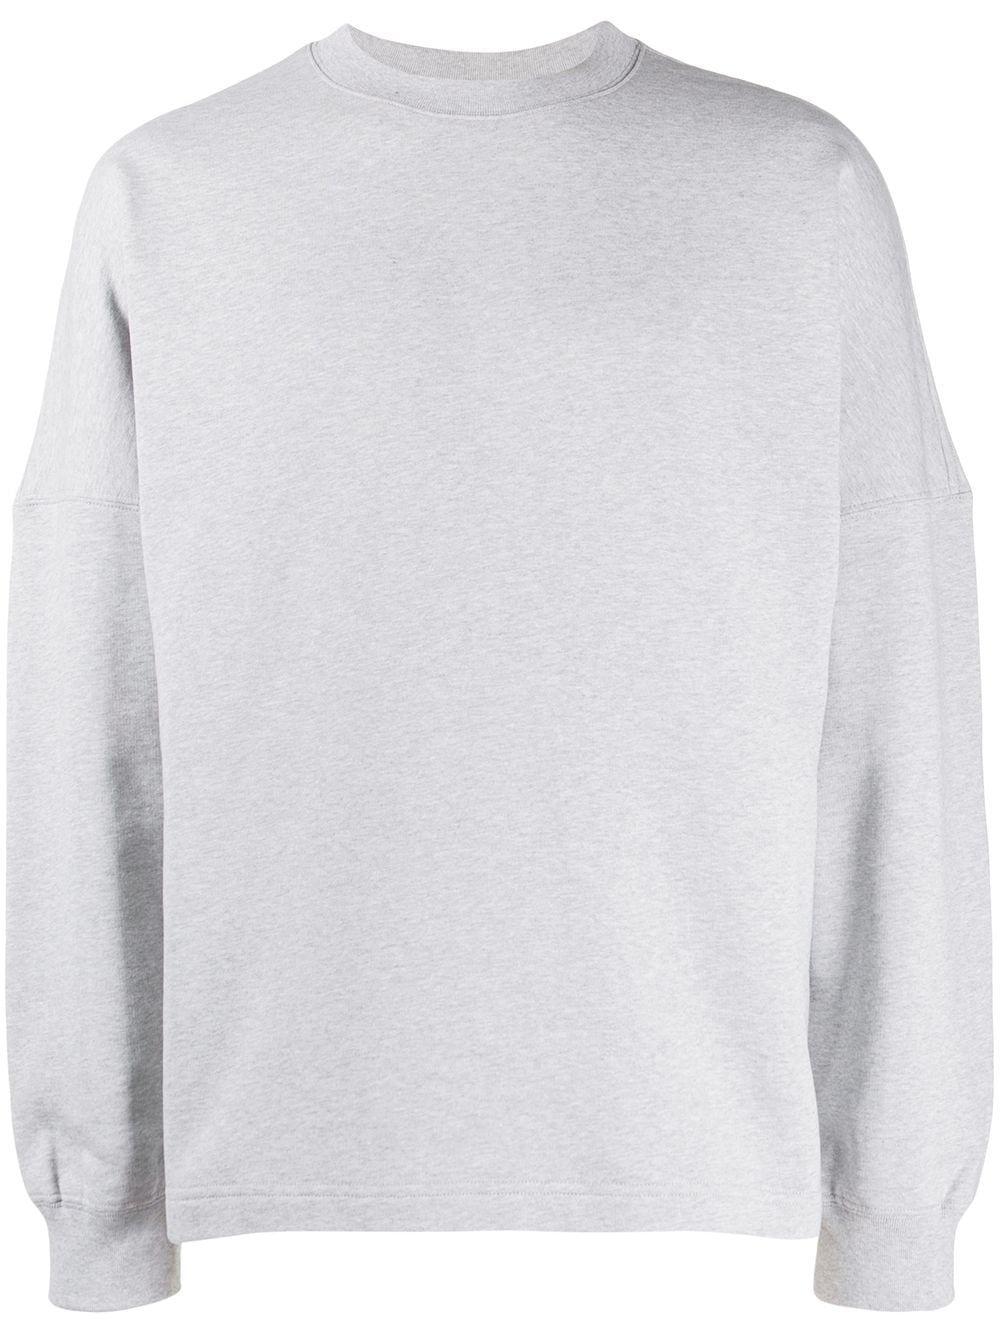 Alexander Wang Back Logo Sweatshirt Sweatshirts Grey Sweatshirt Alexander Wang